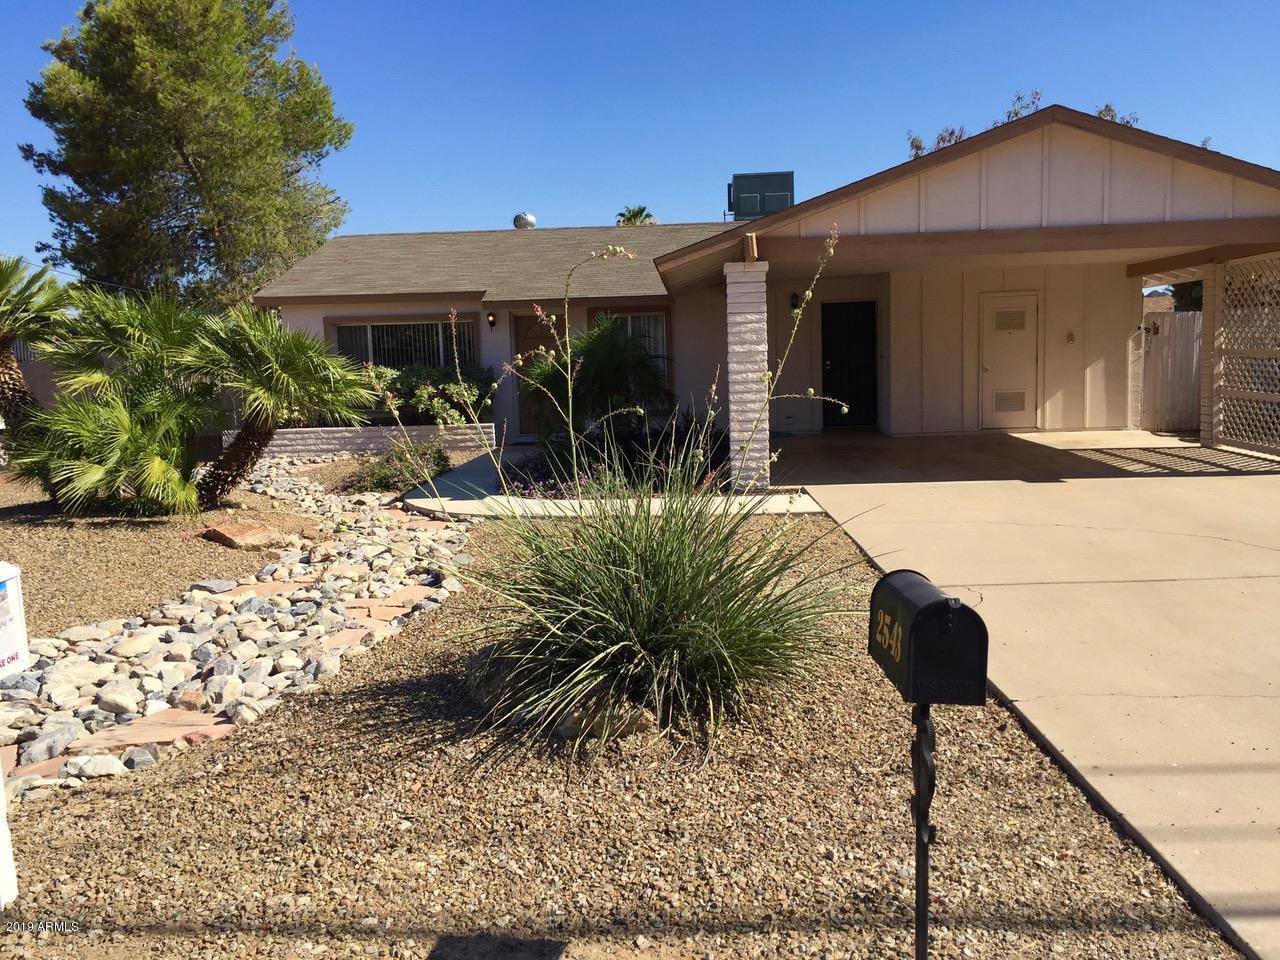 Photo of 2543 E SWEETWATER Avenue, Phoenix, AZ 85032